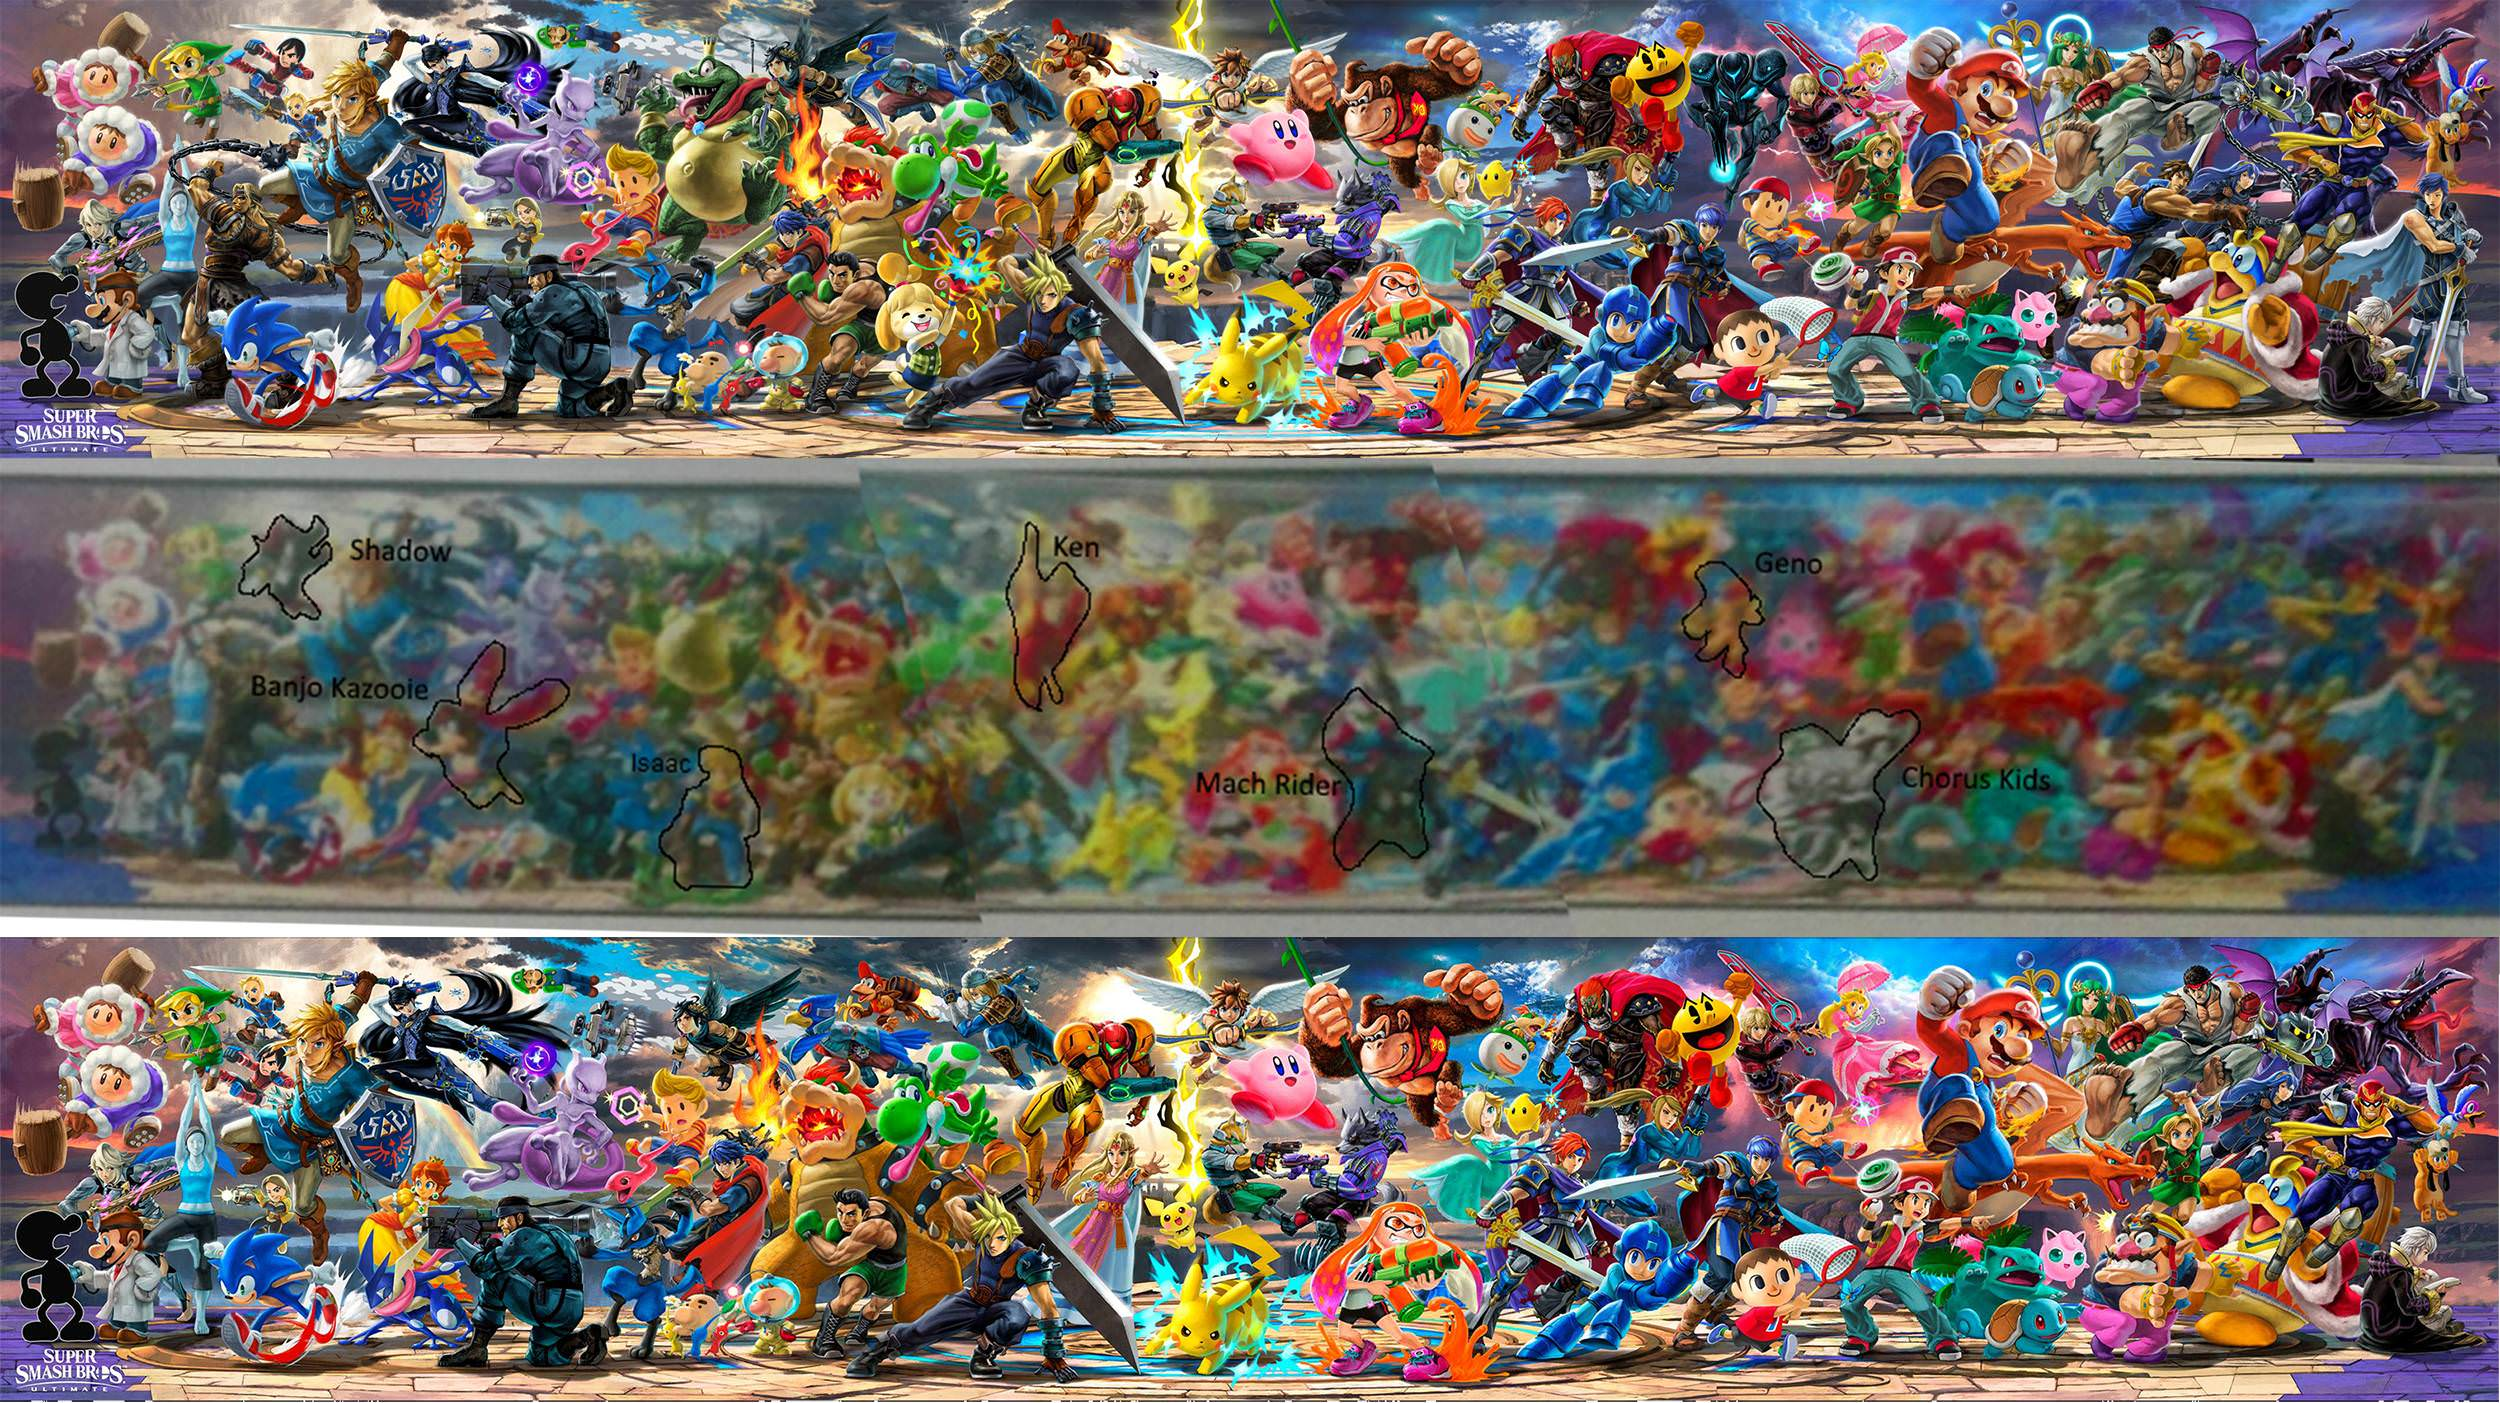 Super Smash Bros Ultimate Leaked Full Poster